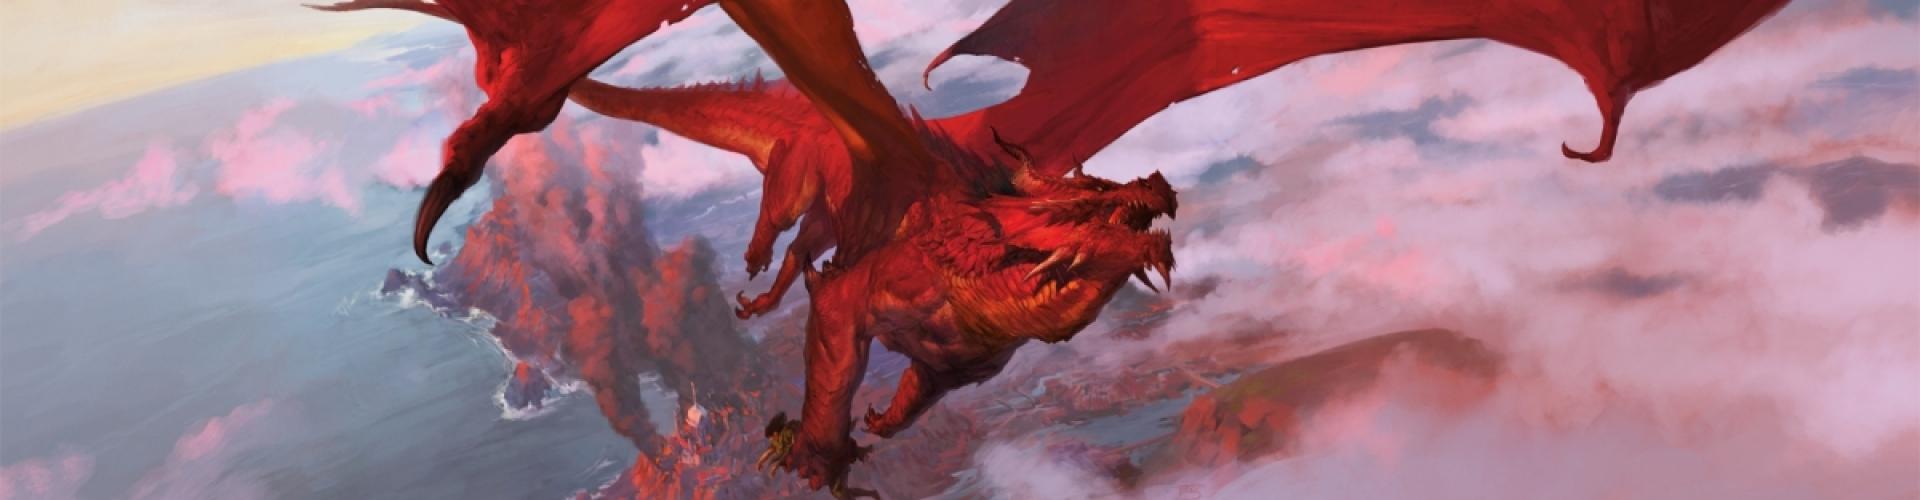 Tyranny of Dragons: Online Comic #7